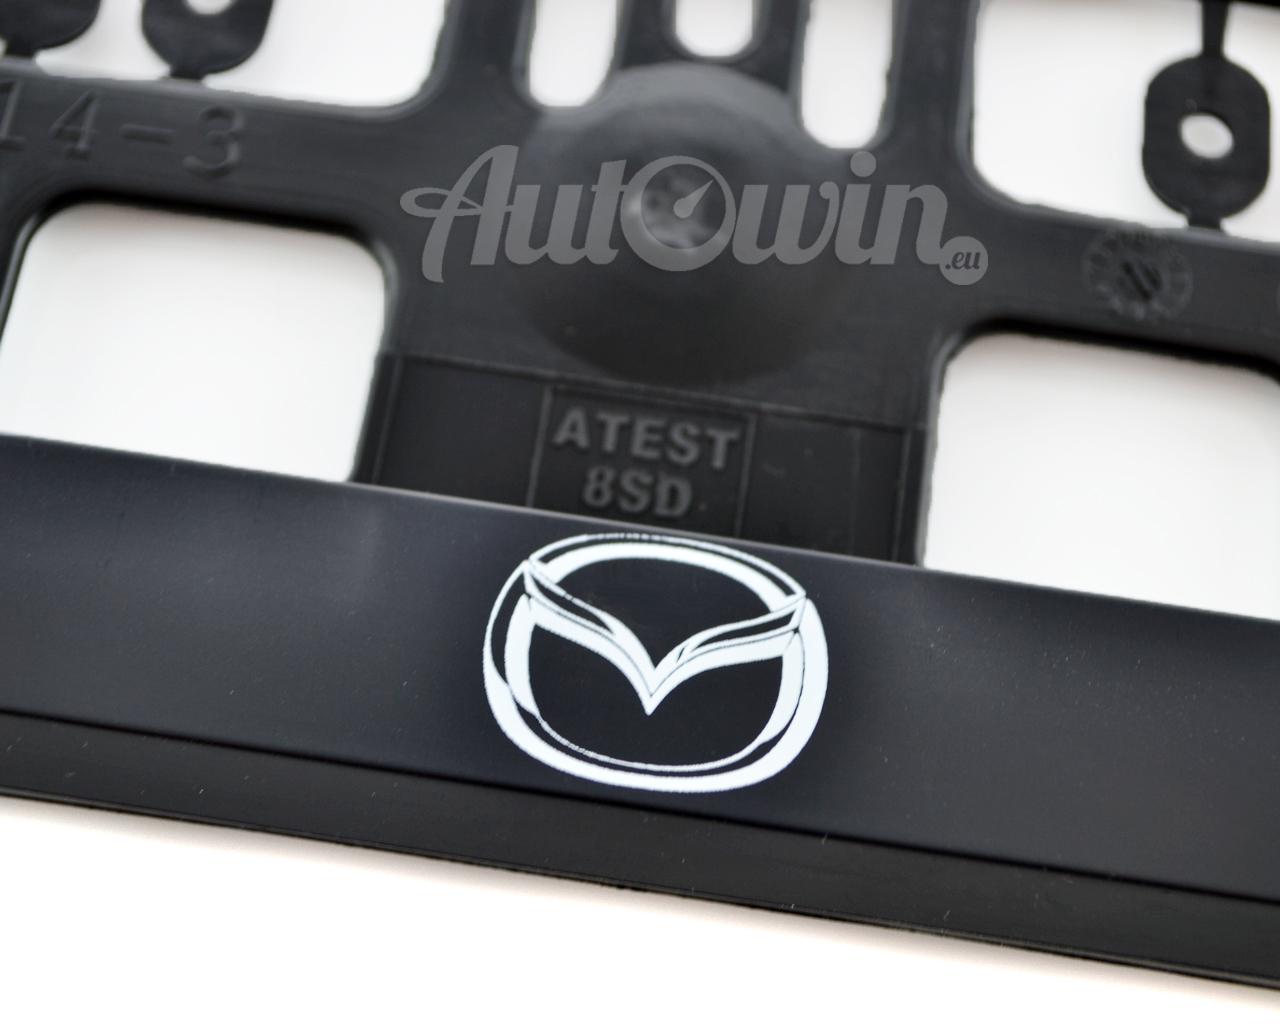 MAZDA CX-3 MAZDA CX-5 Euro Standart License Plates Frames with Mazda ...